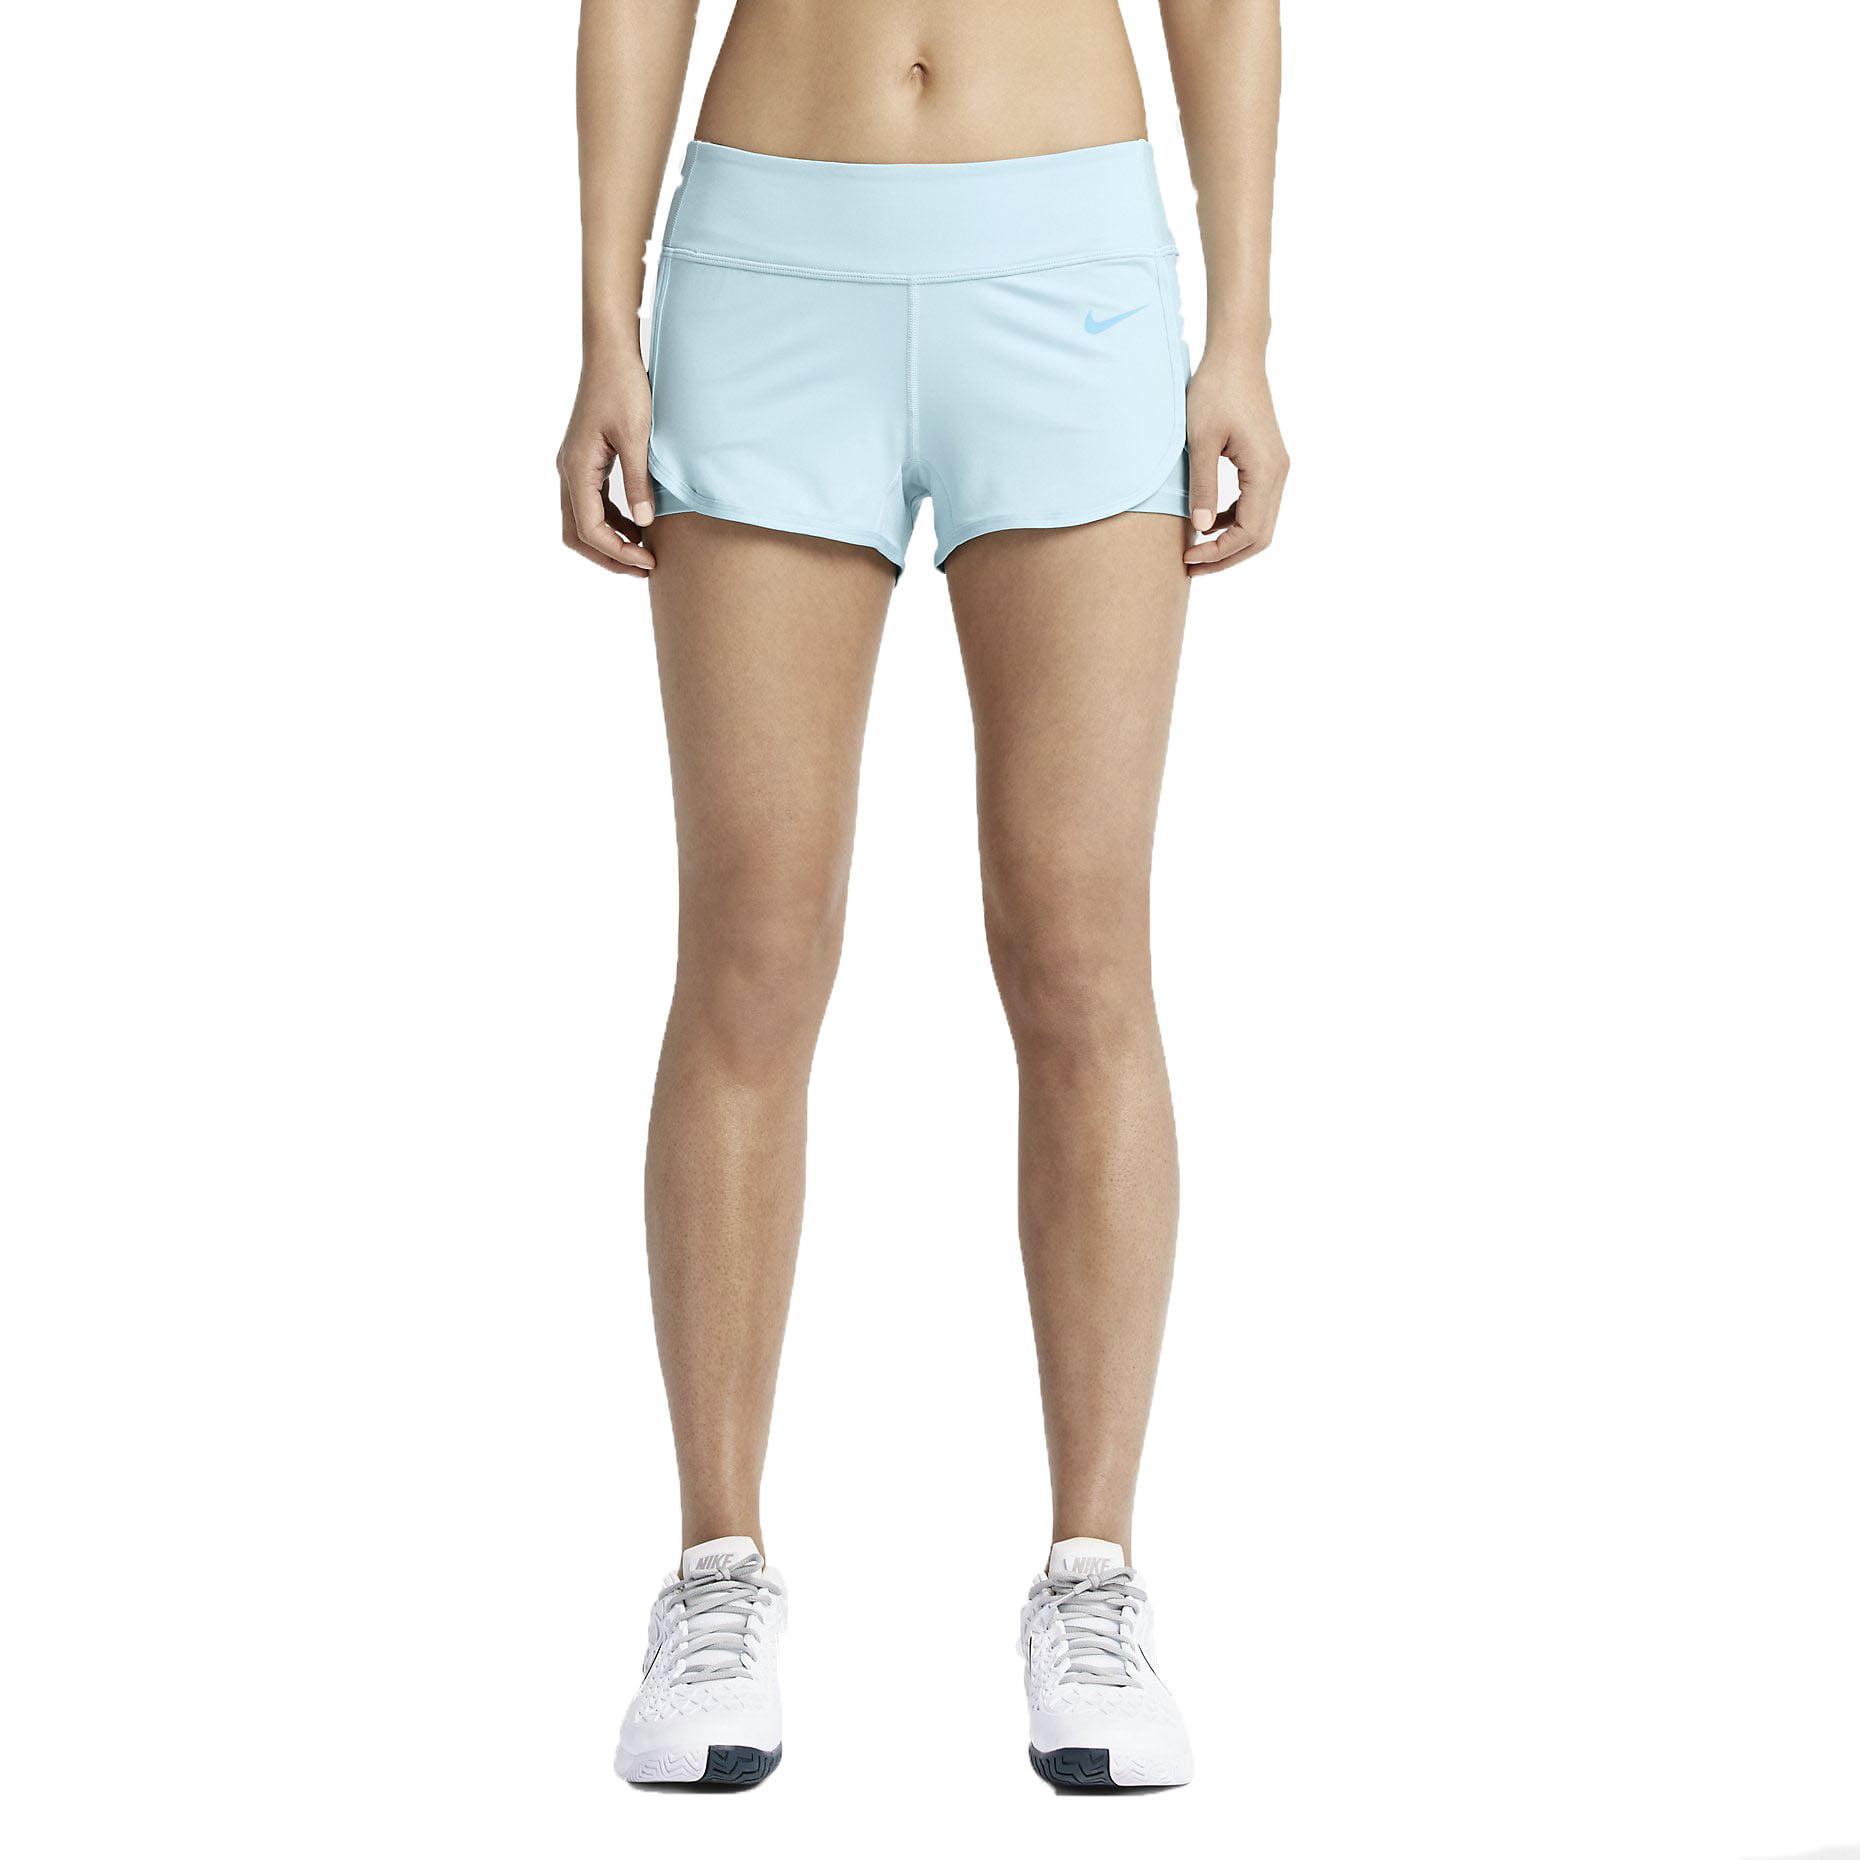 Nike Women's Dri-Fit Ace Court Tennis Shorts-Light Blue-XL by Nike